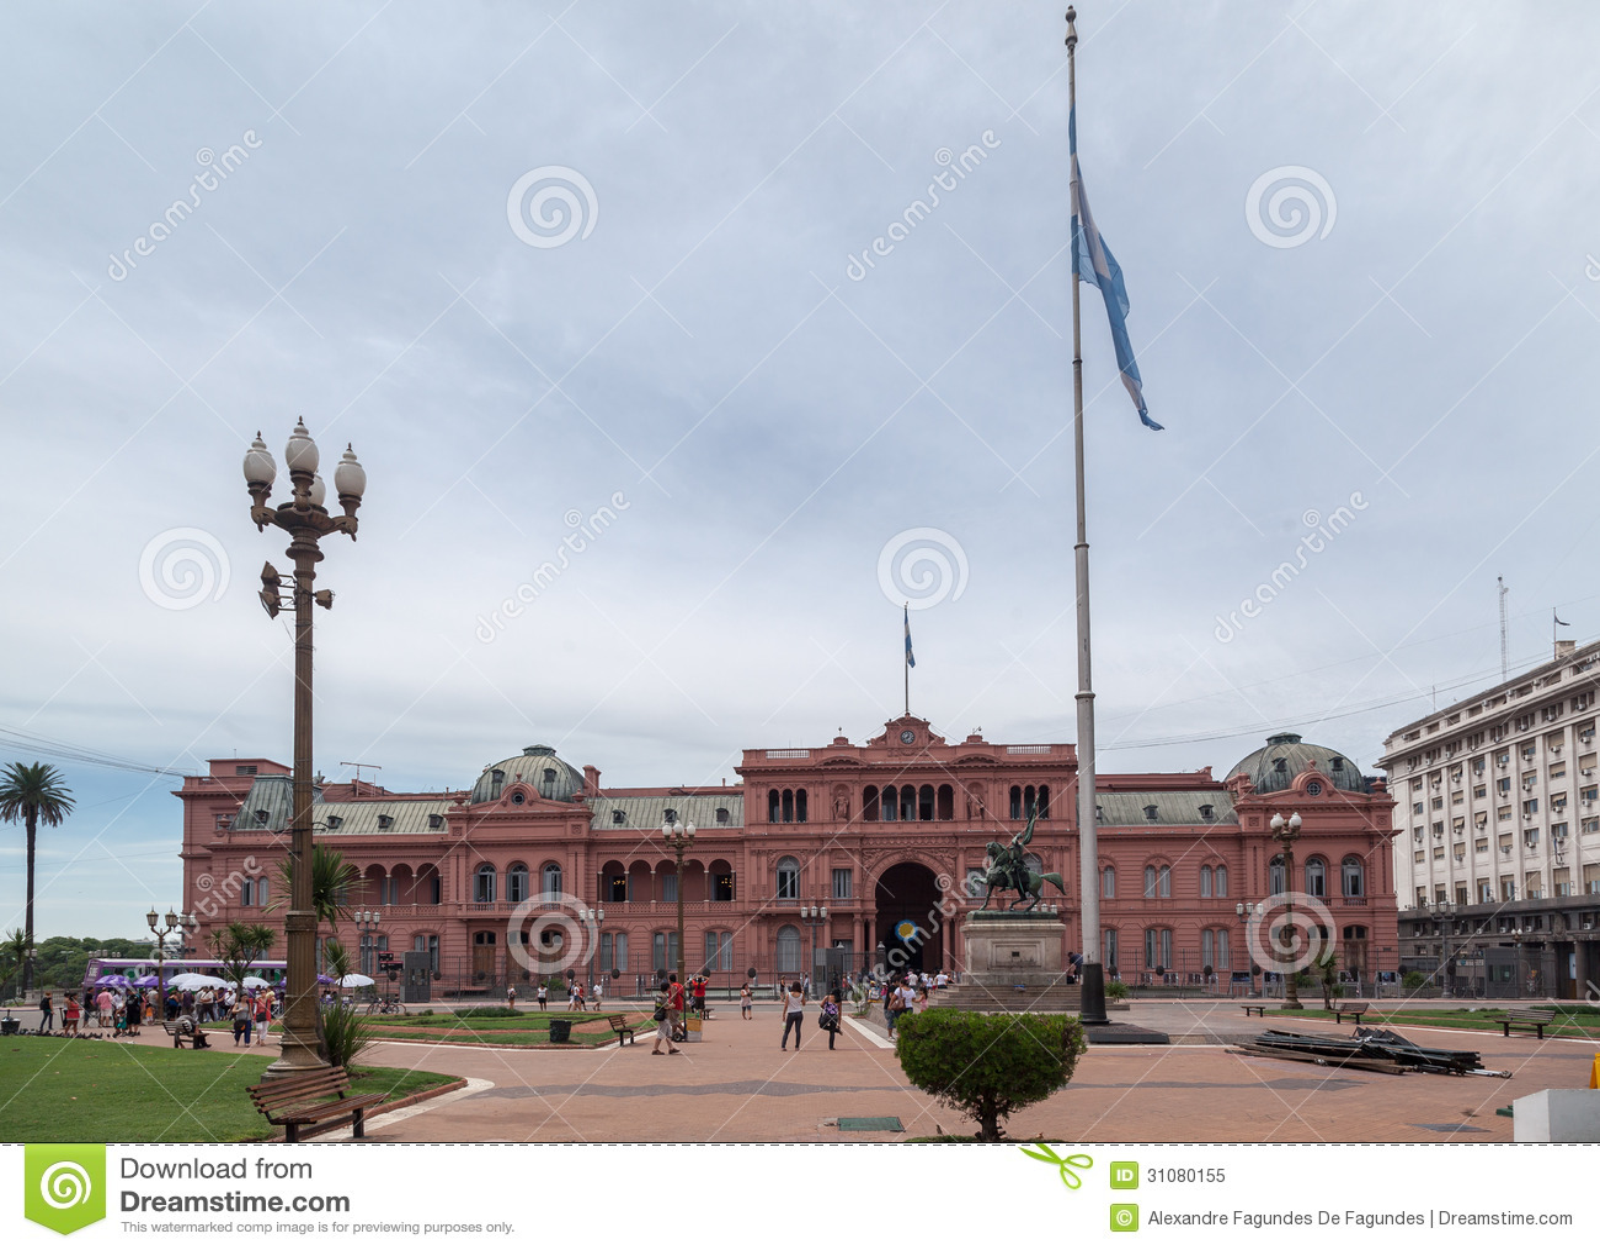 Plaza de mayo casa rosada facade argentina editorial image for Casa argentina